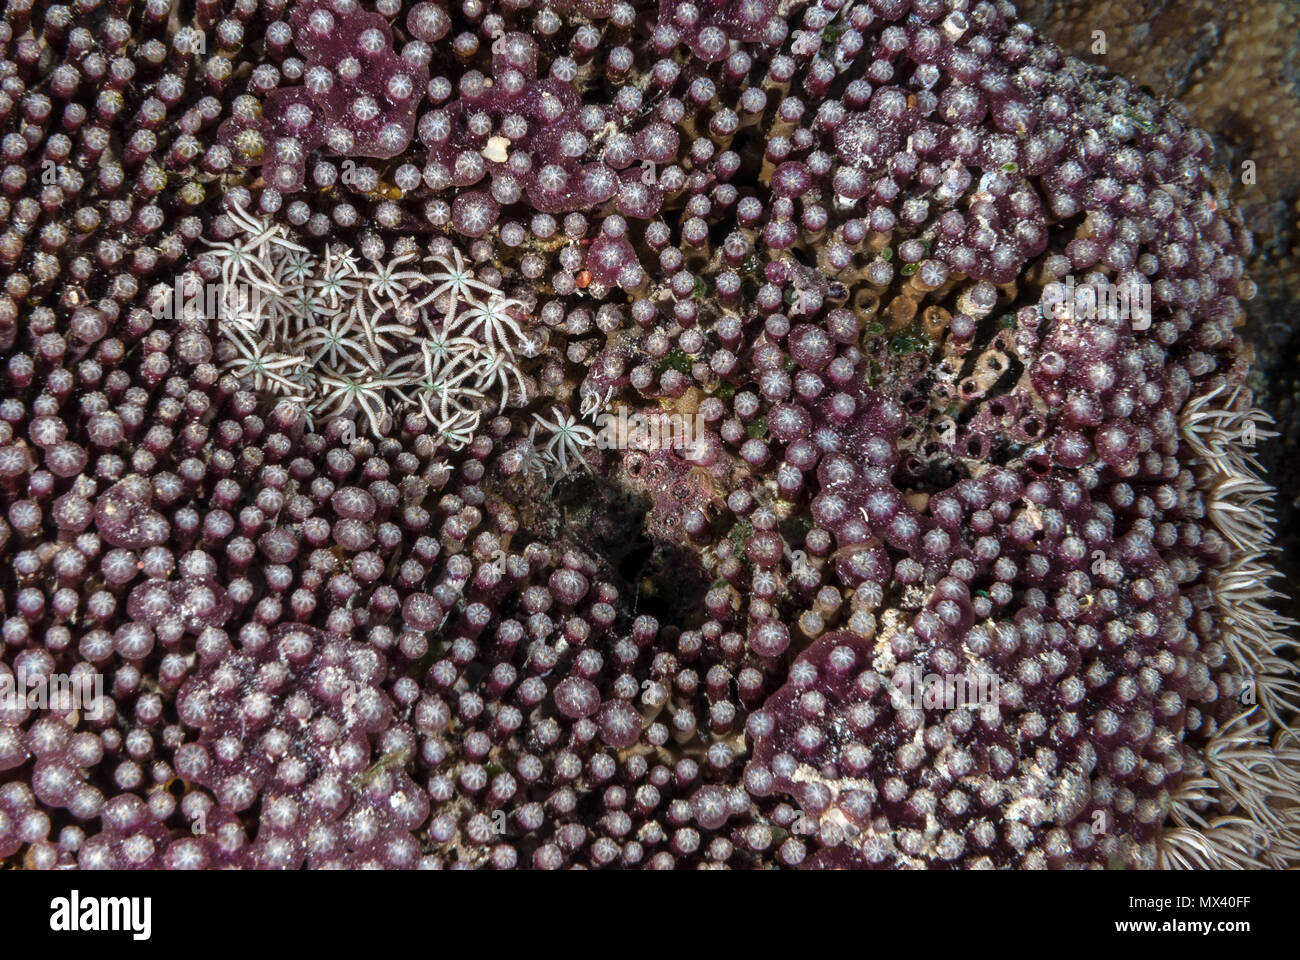 Tuboipora Organpipe Coral, musica, Tubiporidae, Sharm el-Sheik, Mar Rojo, Egipto Imagen De Stock